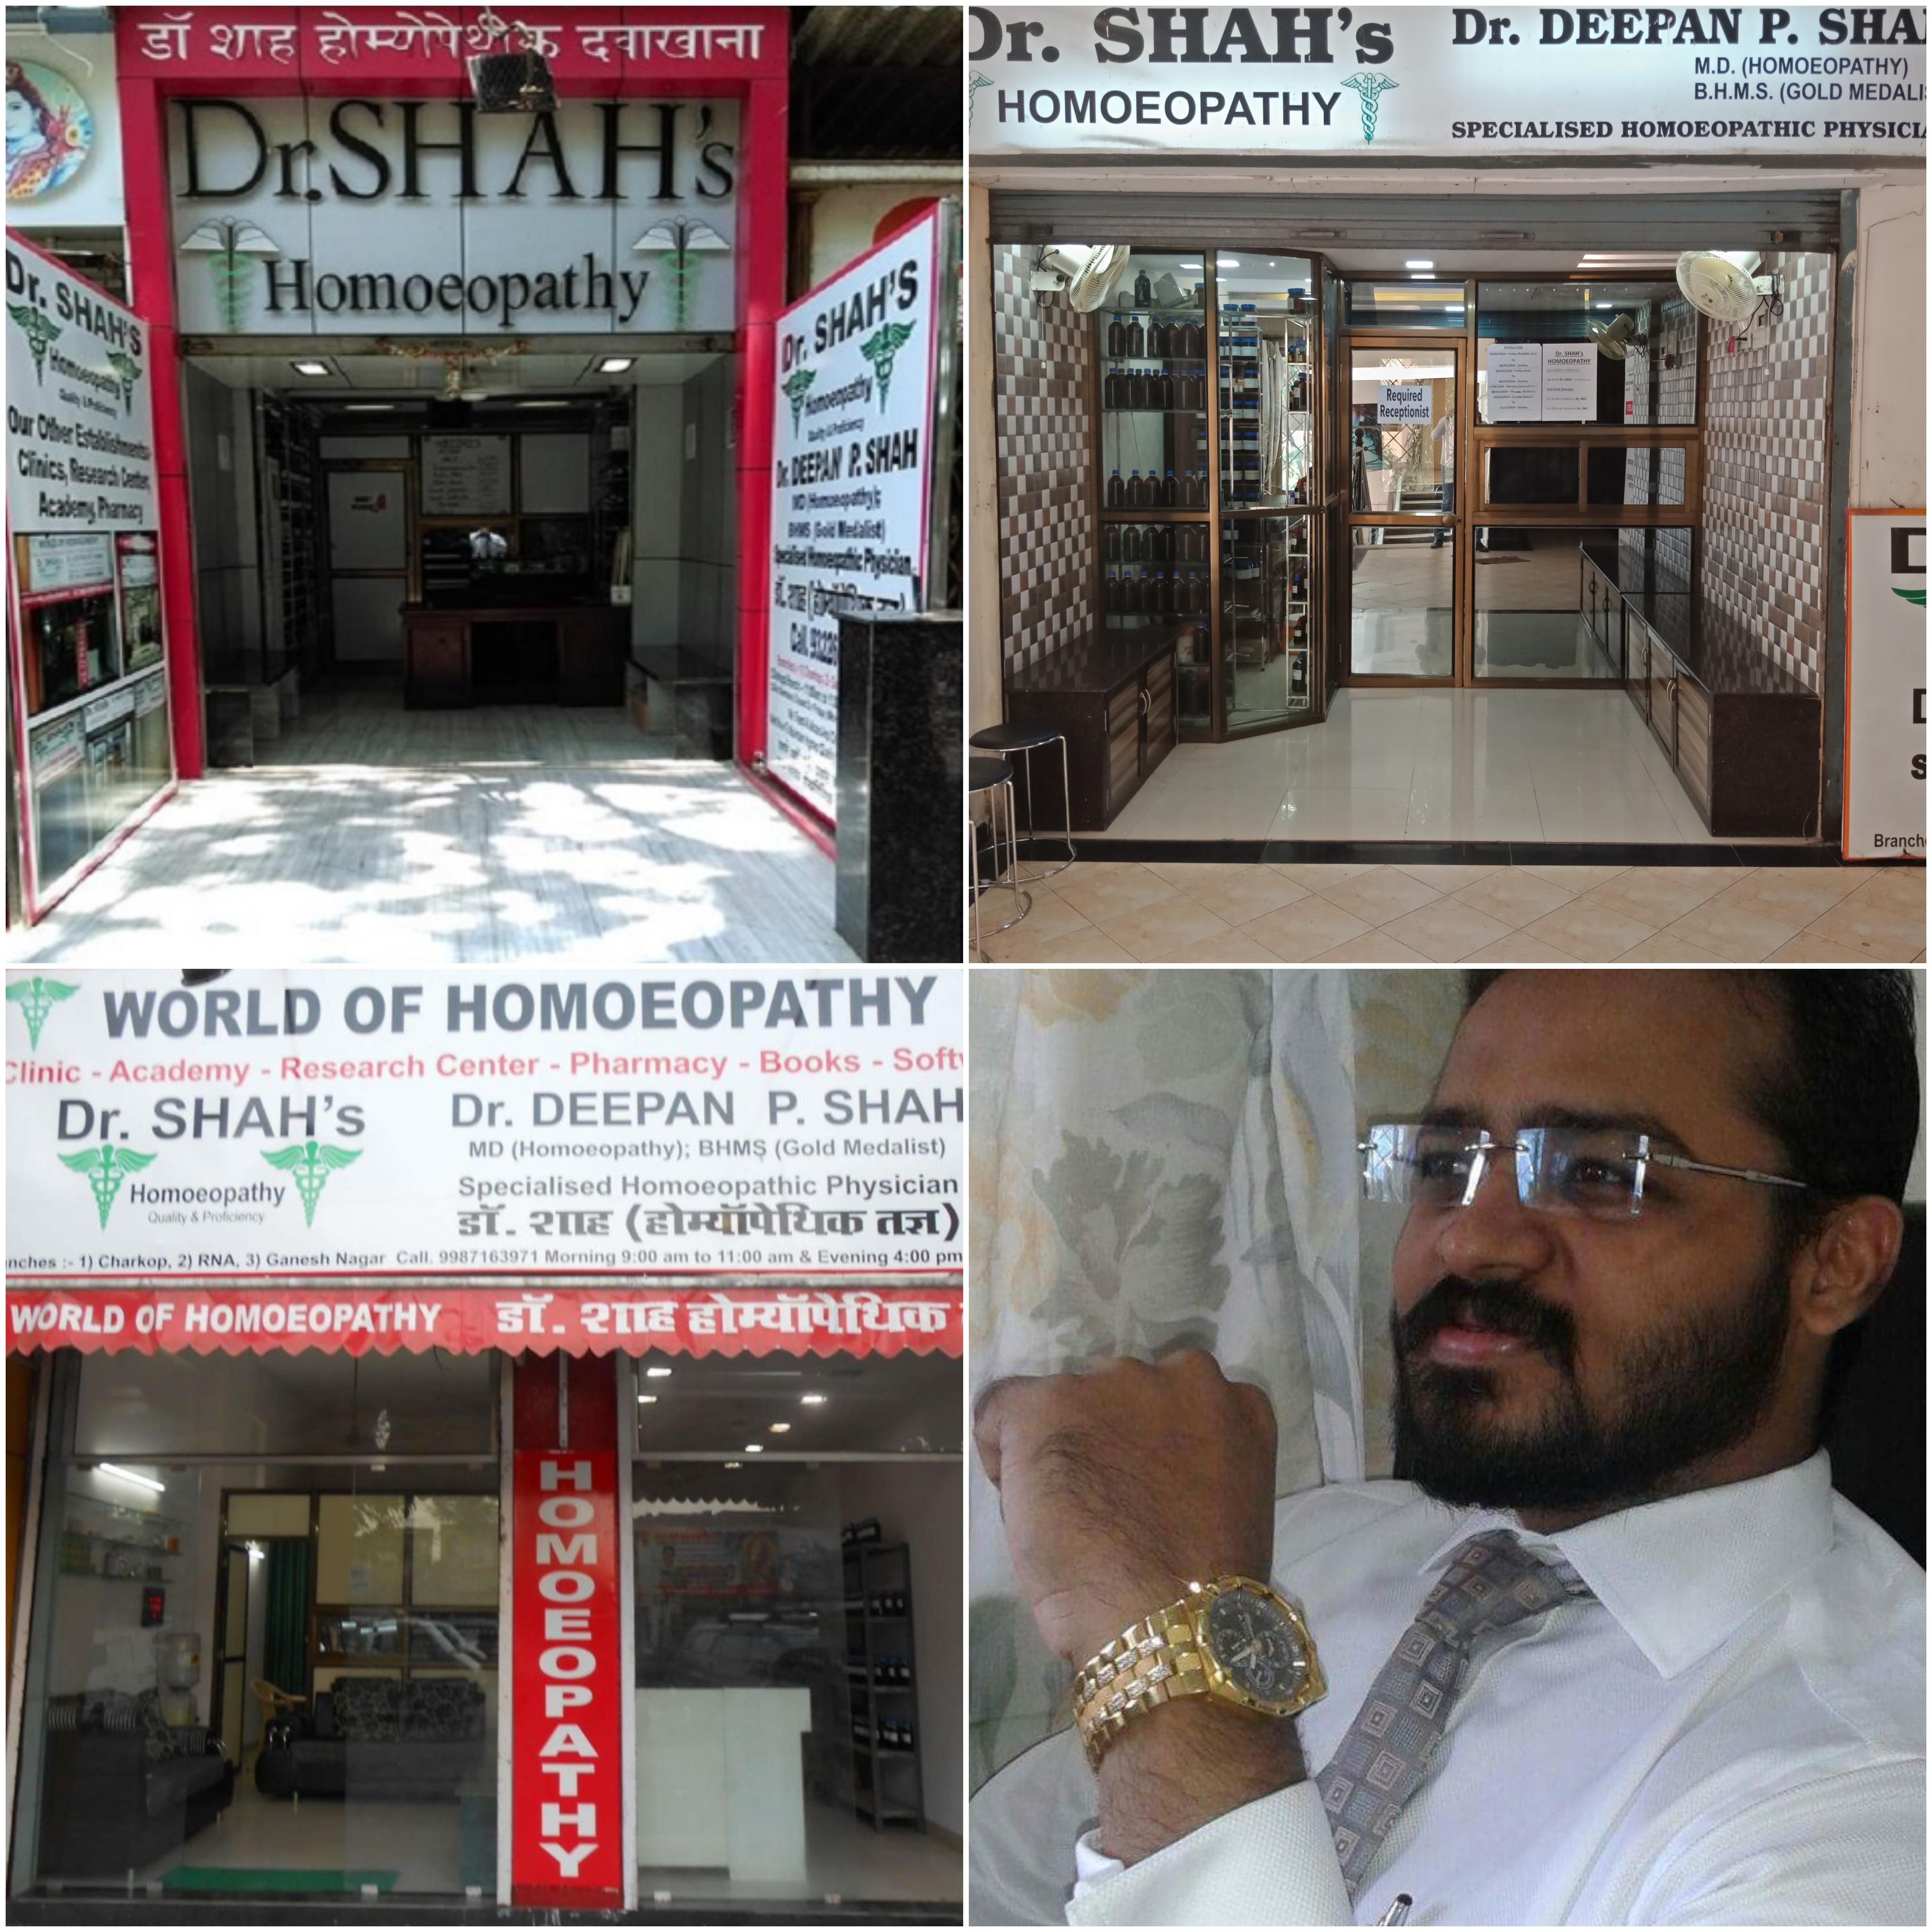 Homeopathic Doctor Mumbai, MD, Dr SHAH Homeopathy Clinic Mumbai